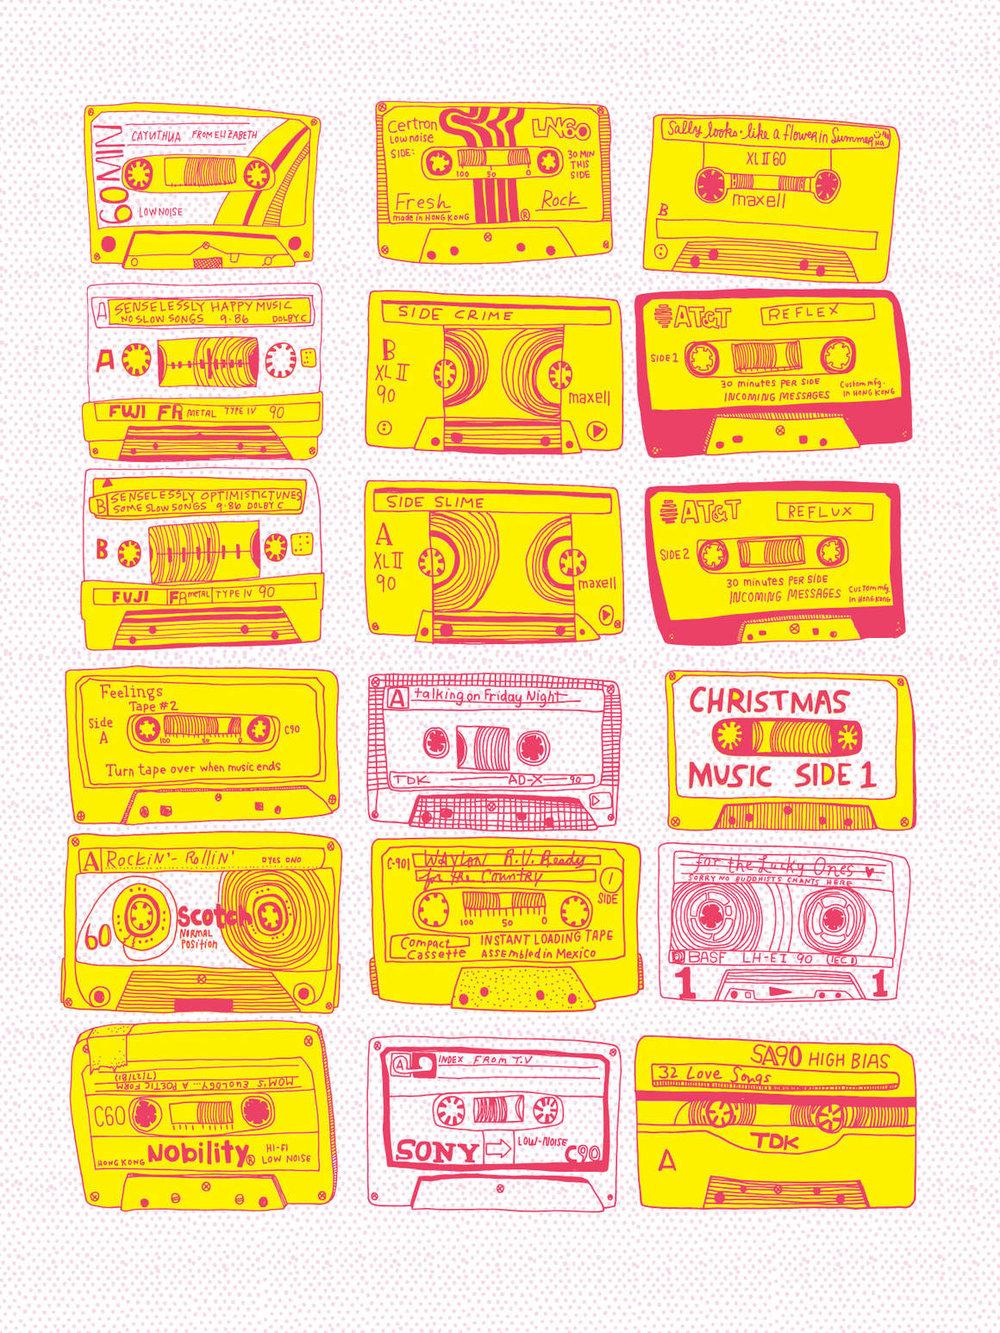 kate-bingaman-burt-mixtape-v1-print-MAIN-563a4d4d9ddbd-1160.jpg